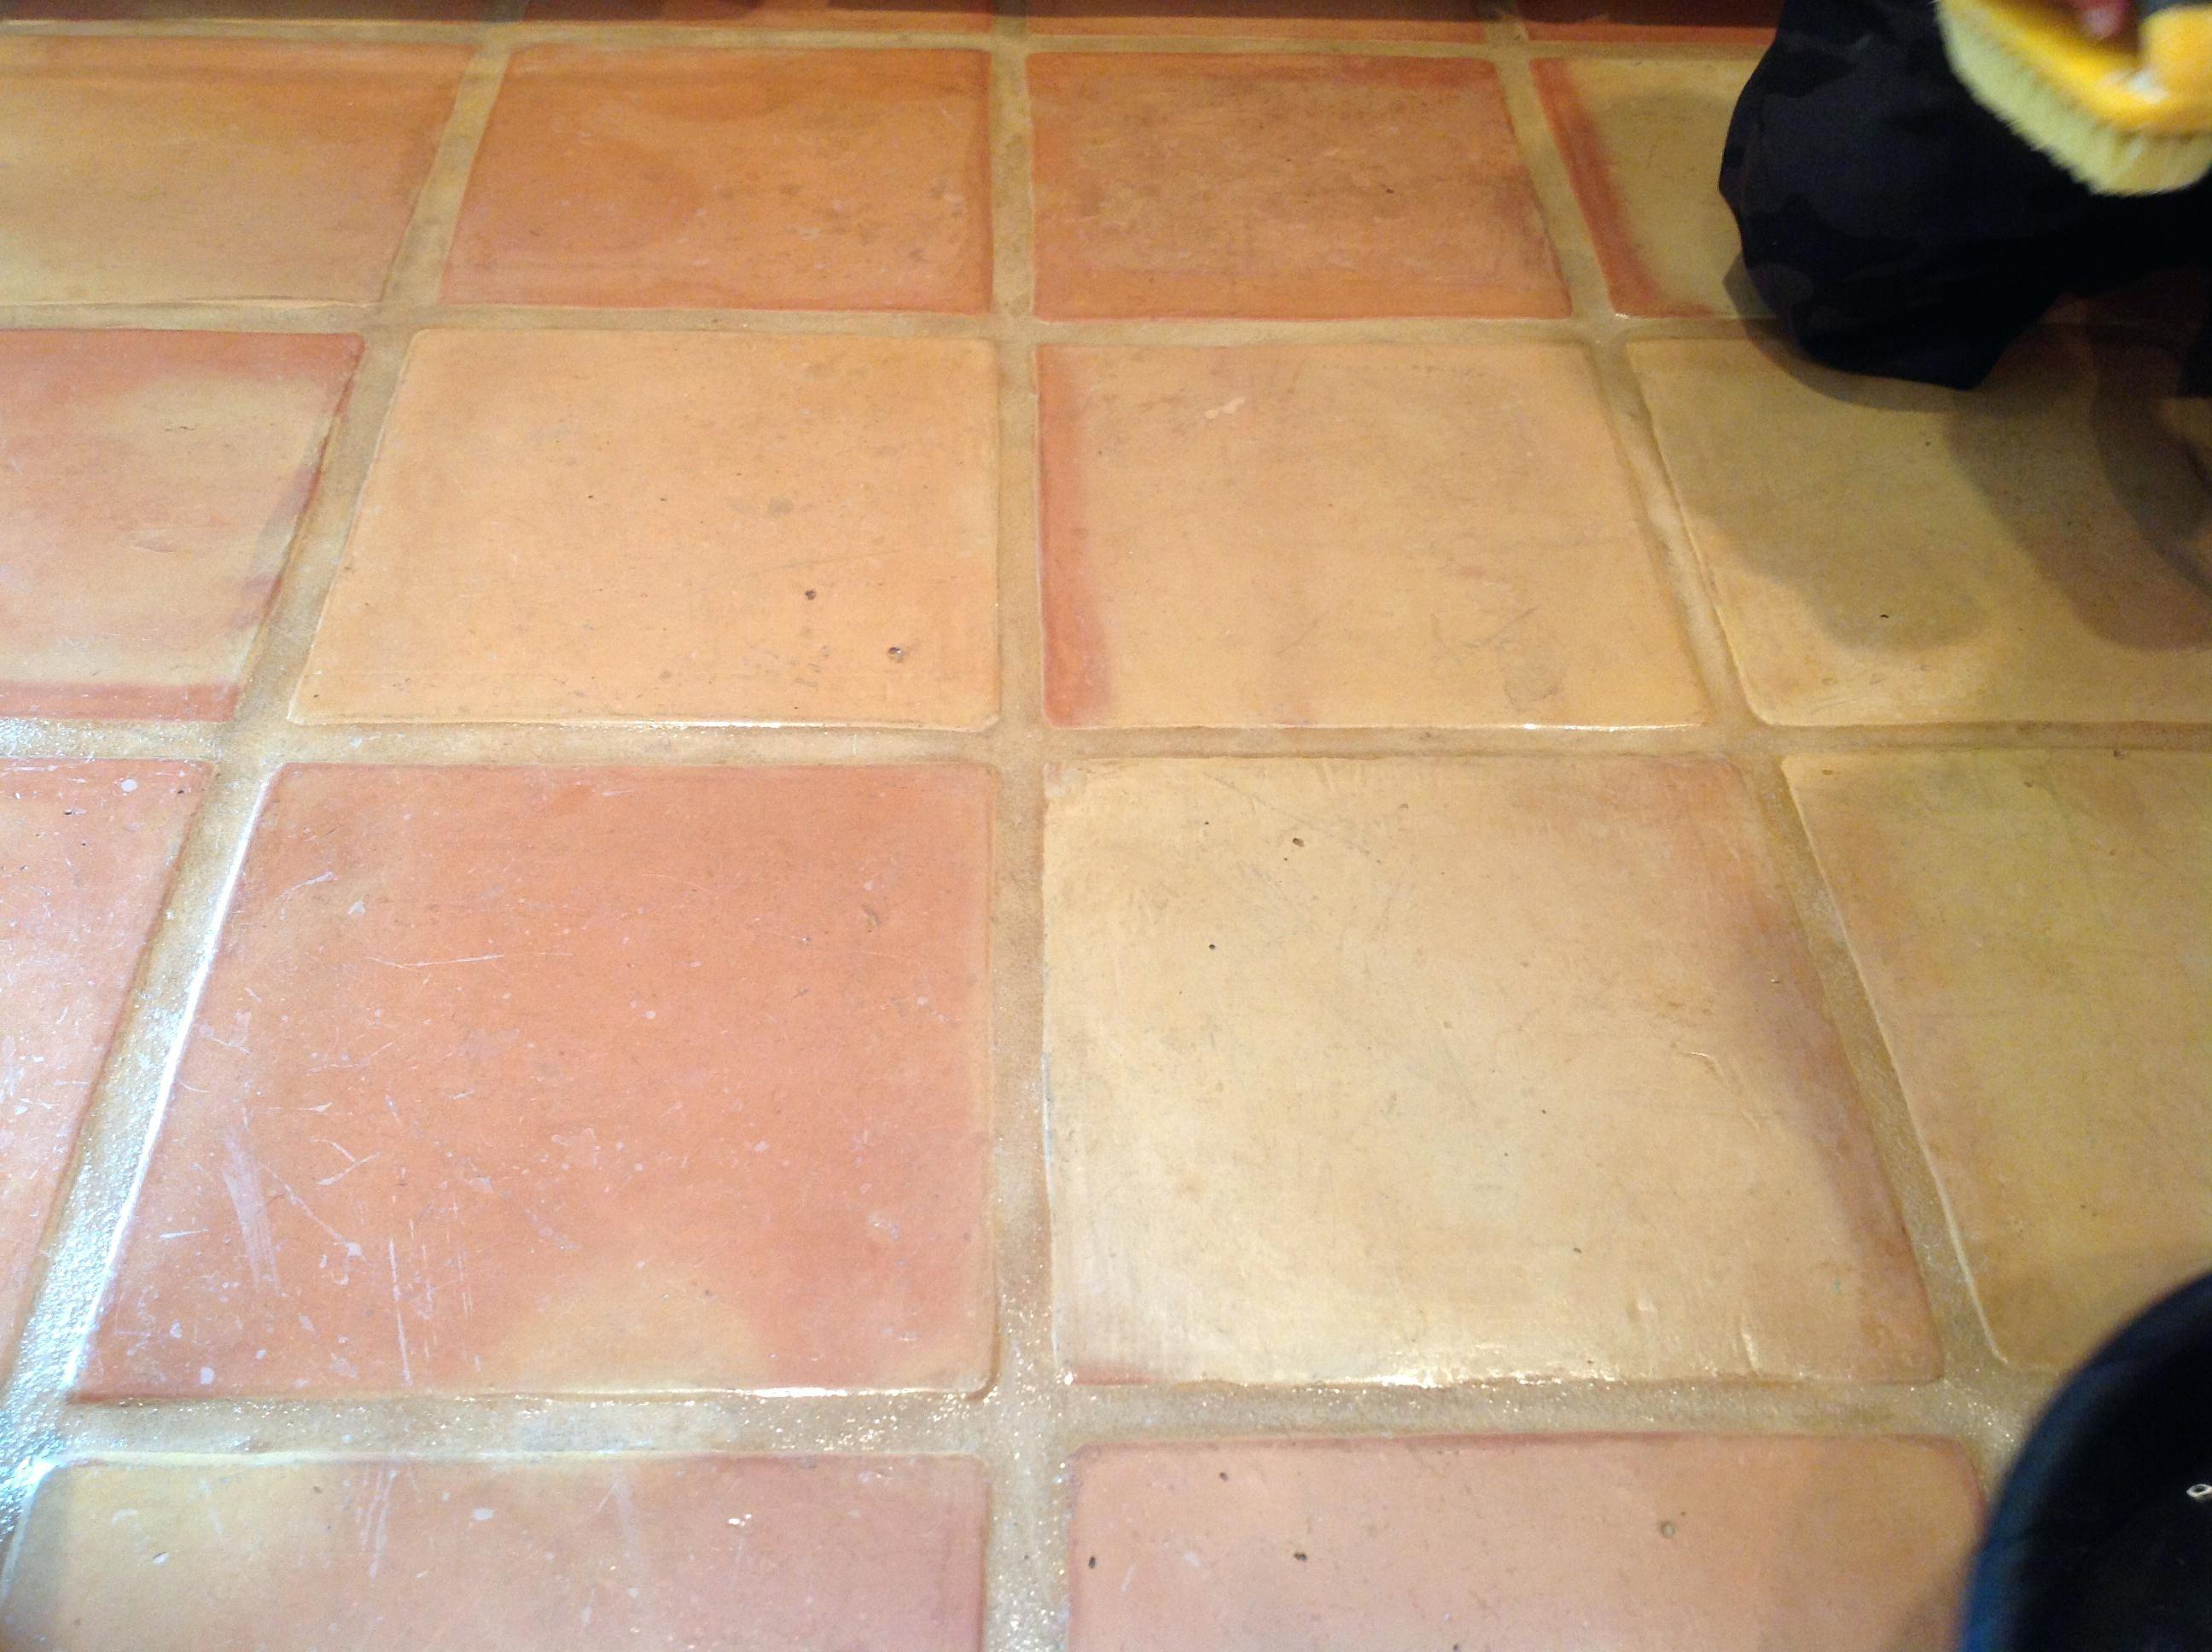 Dull ceramic tile flooring httpnextsoft21 pinterest tile flooring dailygadgetfo Choice Image